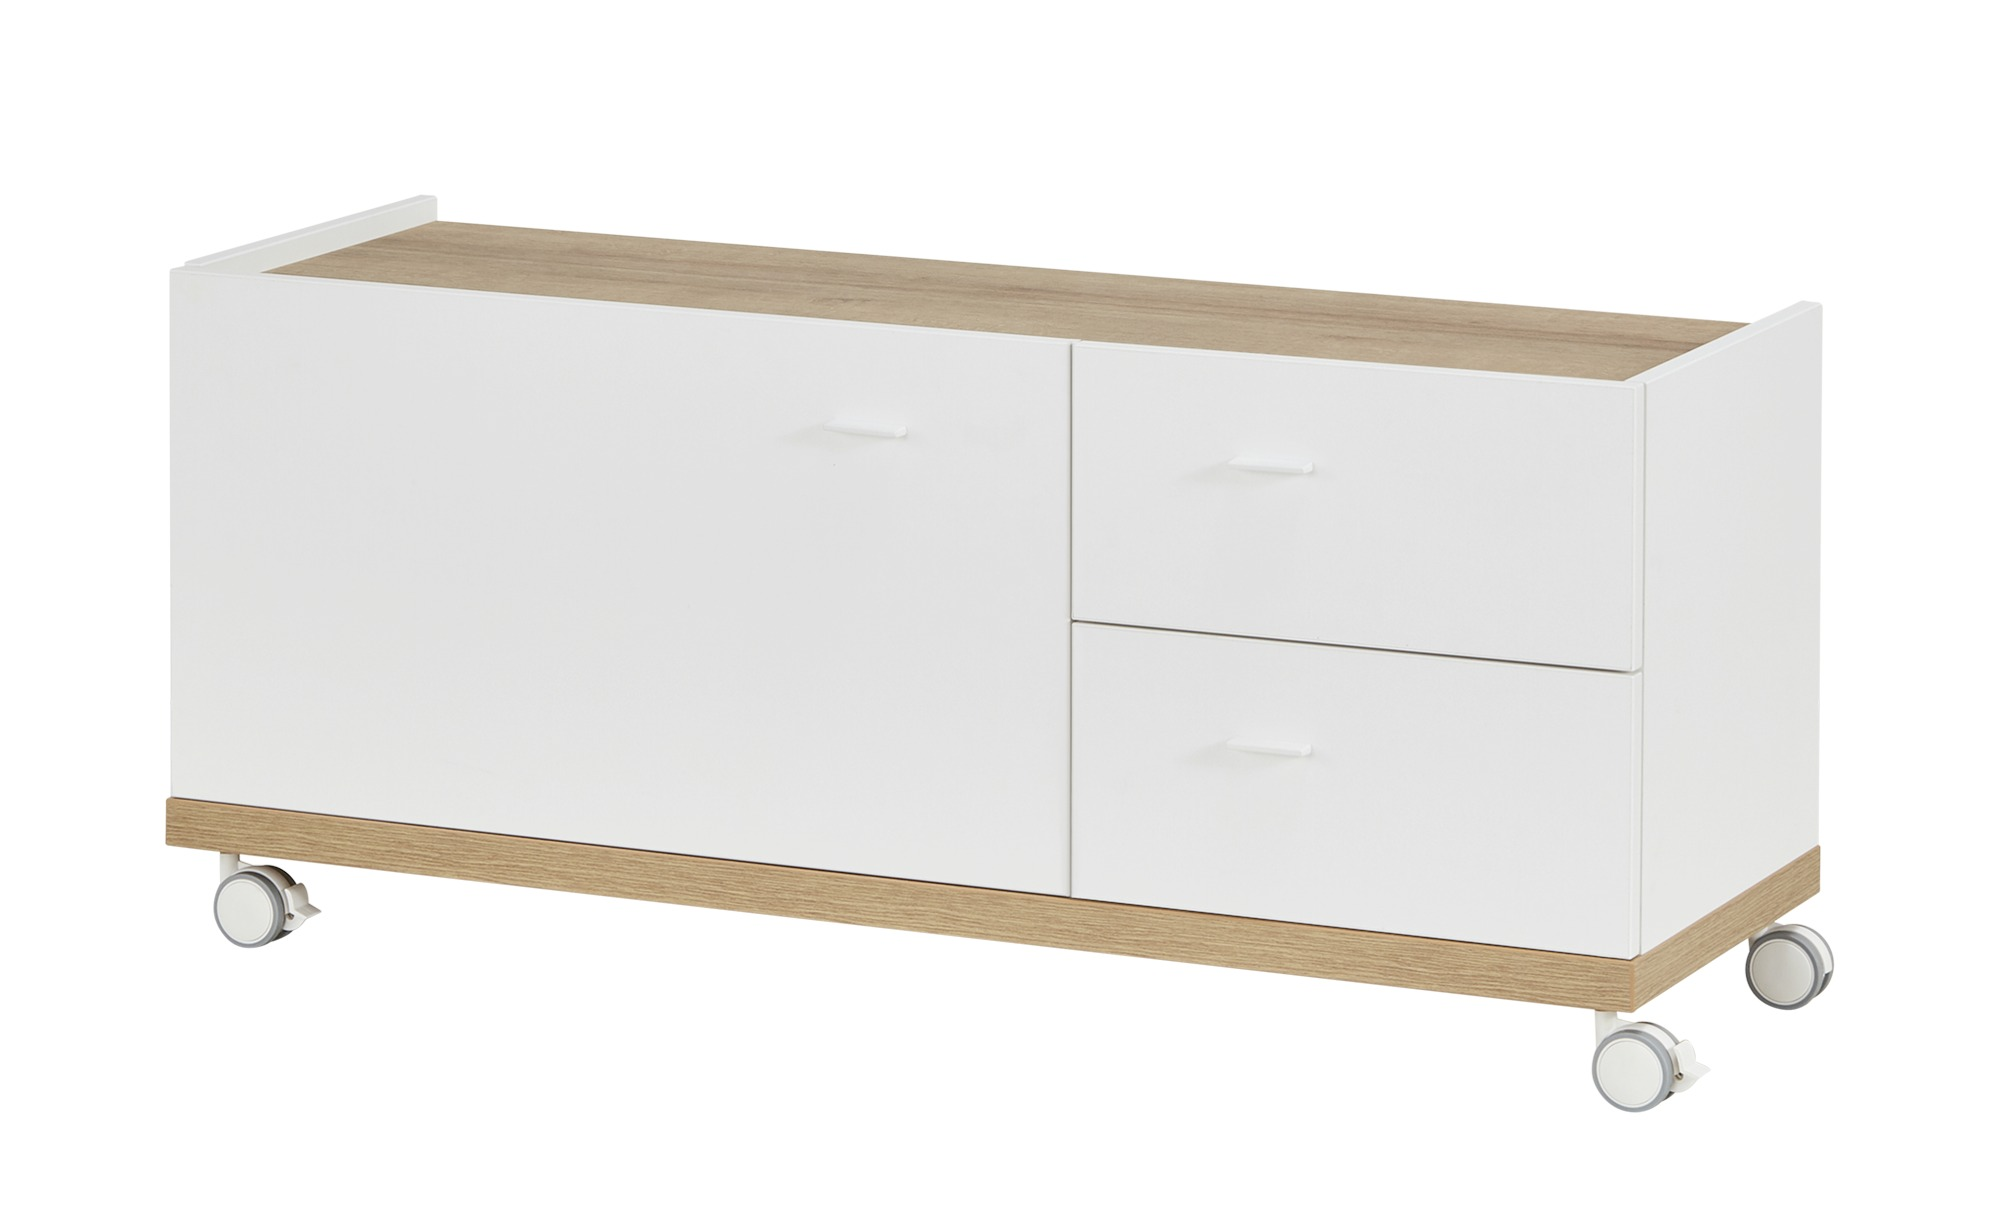 Lowboard  Moby ¦ weiß ¦ Maße (cm): B: 120 H: 50 T: 40 Kommoden & Sideboards > Lowboards - Höffner